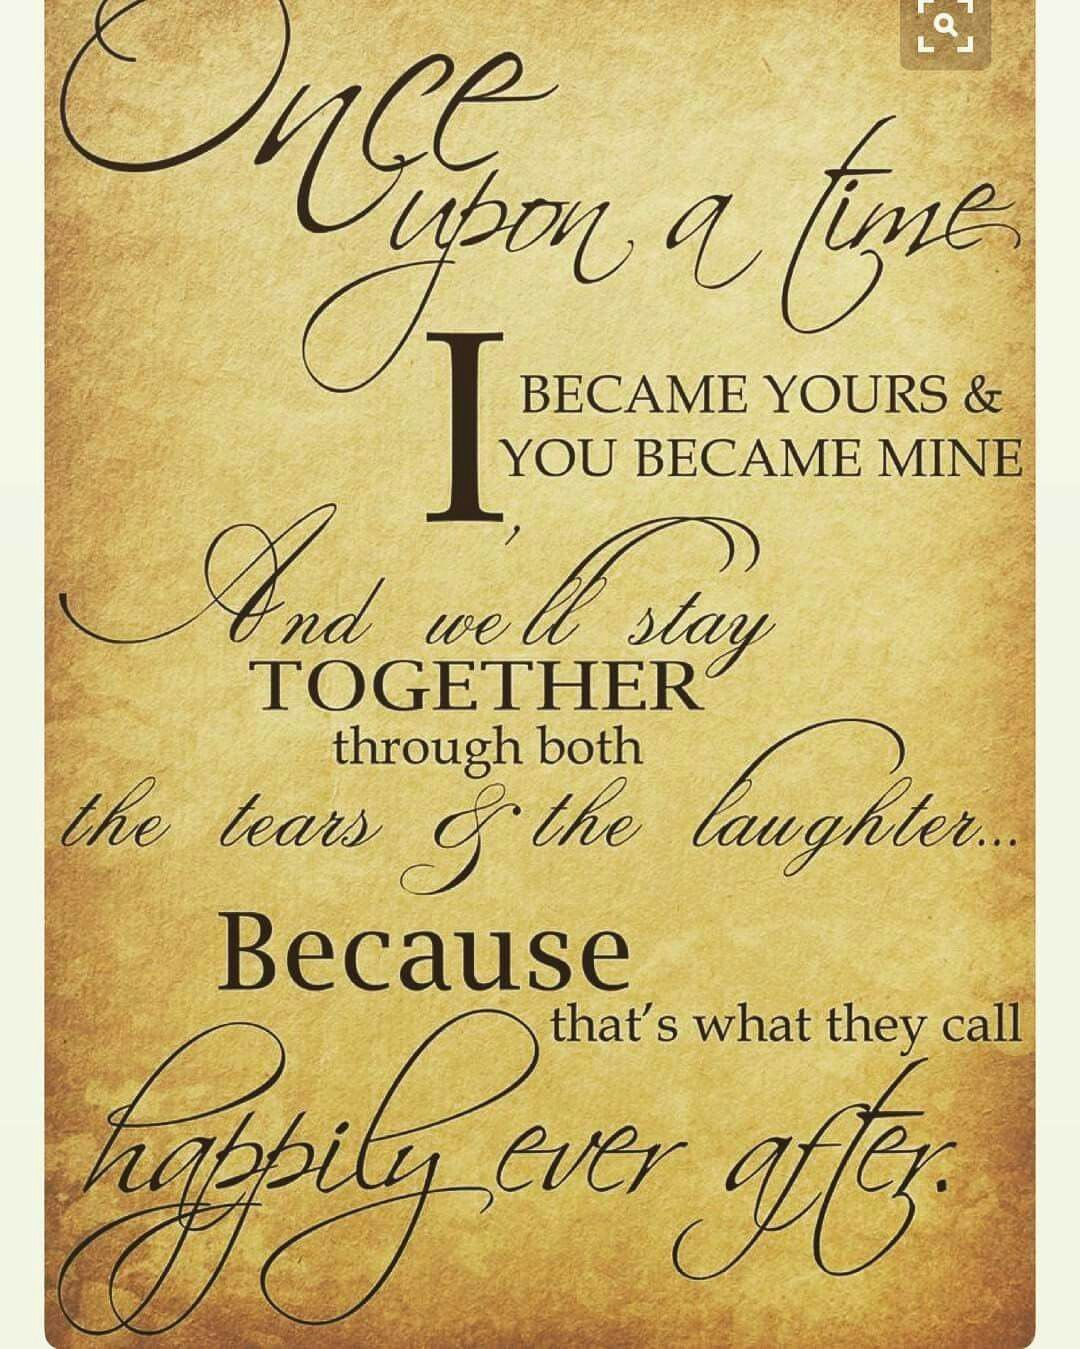 10 Year Wedding Anniversary Quotes: Pin By Brittain Jade On Friendship Designs